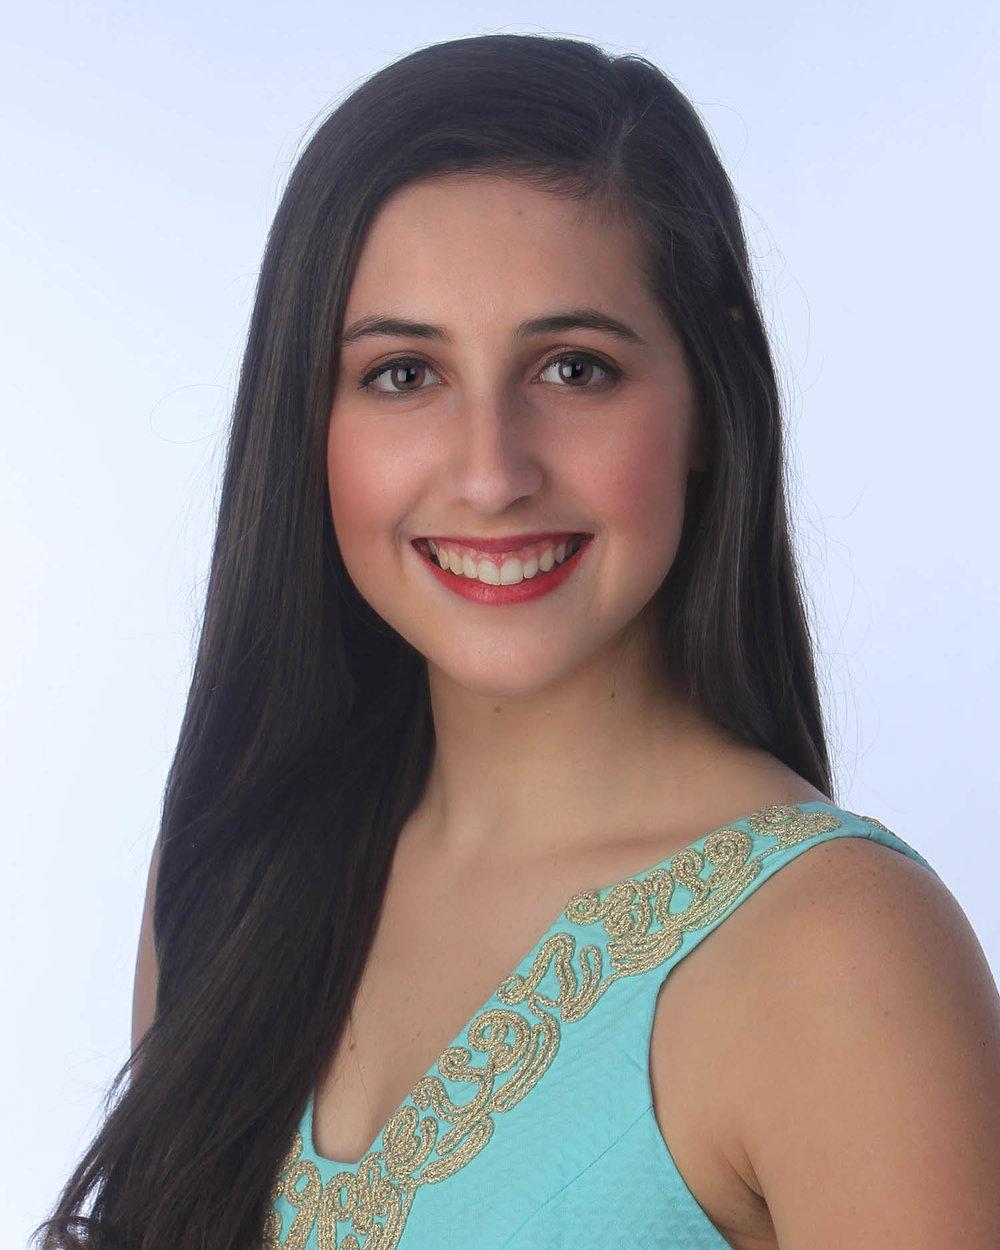 MORGAN JOHNSON    Crown City   Talent:  Acrobatic Dance   Platform:  Smiling For A Brighter Future